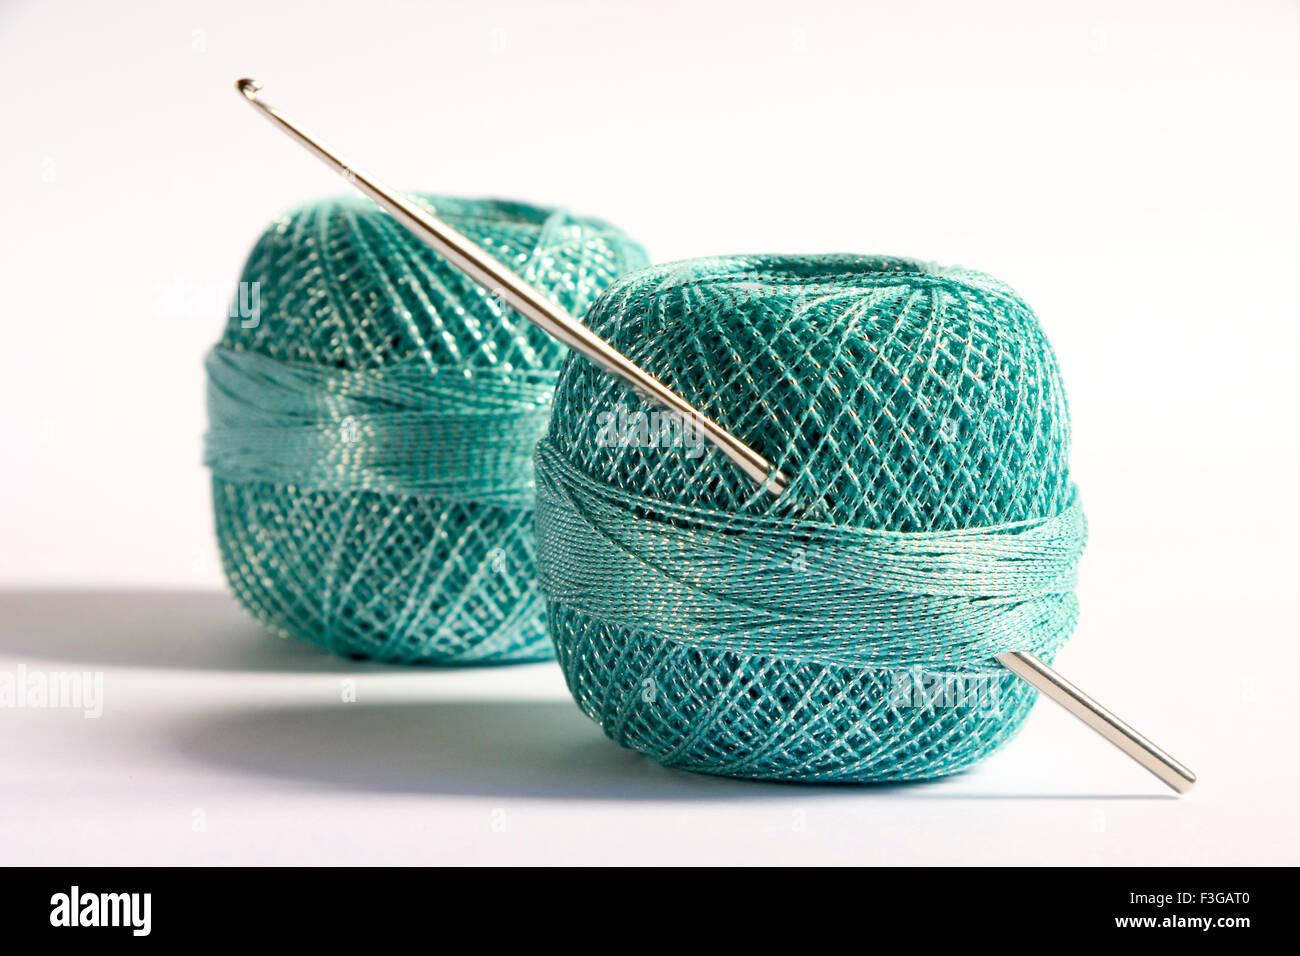 Knitting Circle Stock Photos & Knitting Circle Stock Images - Alamy